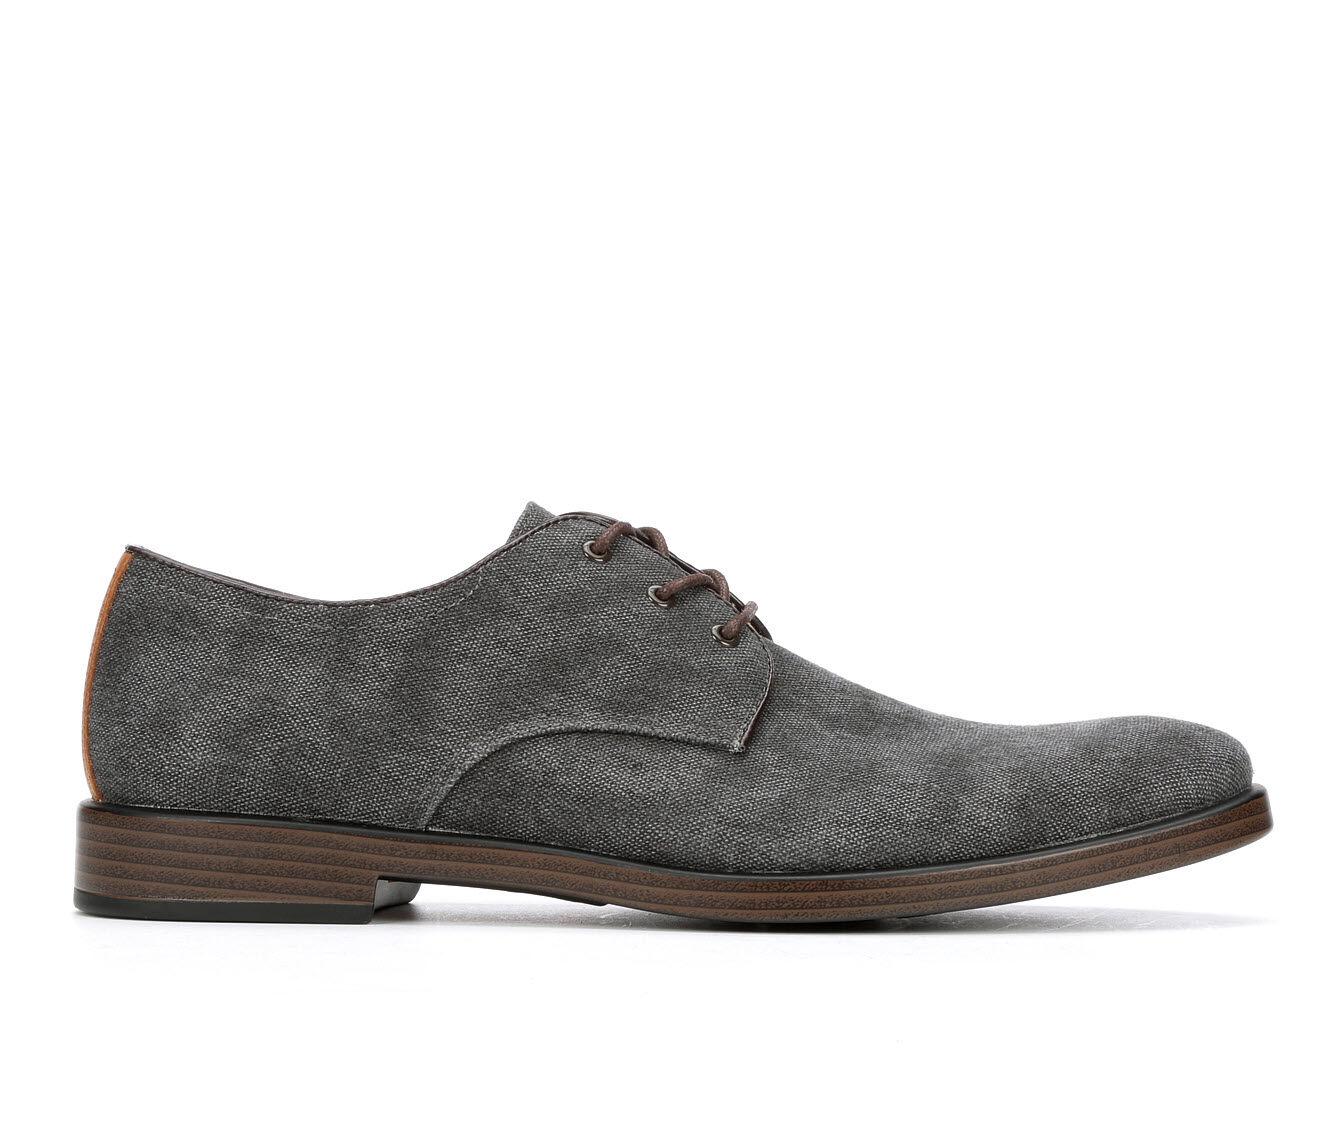 uk shoes_kd1476